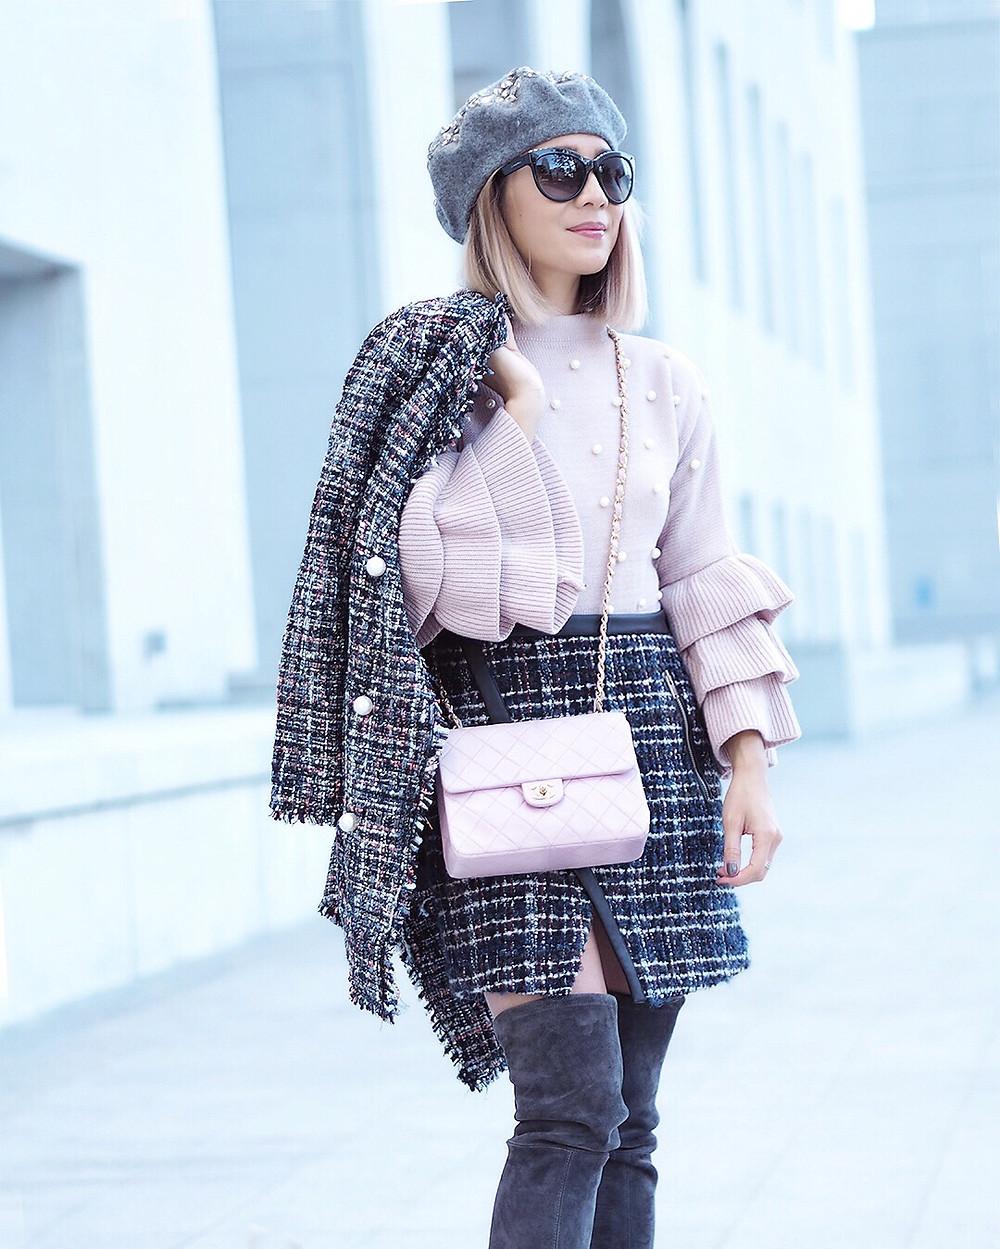 Pearls, Pink and Tweed | Lam in Louboutins